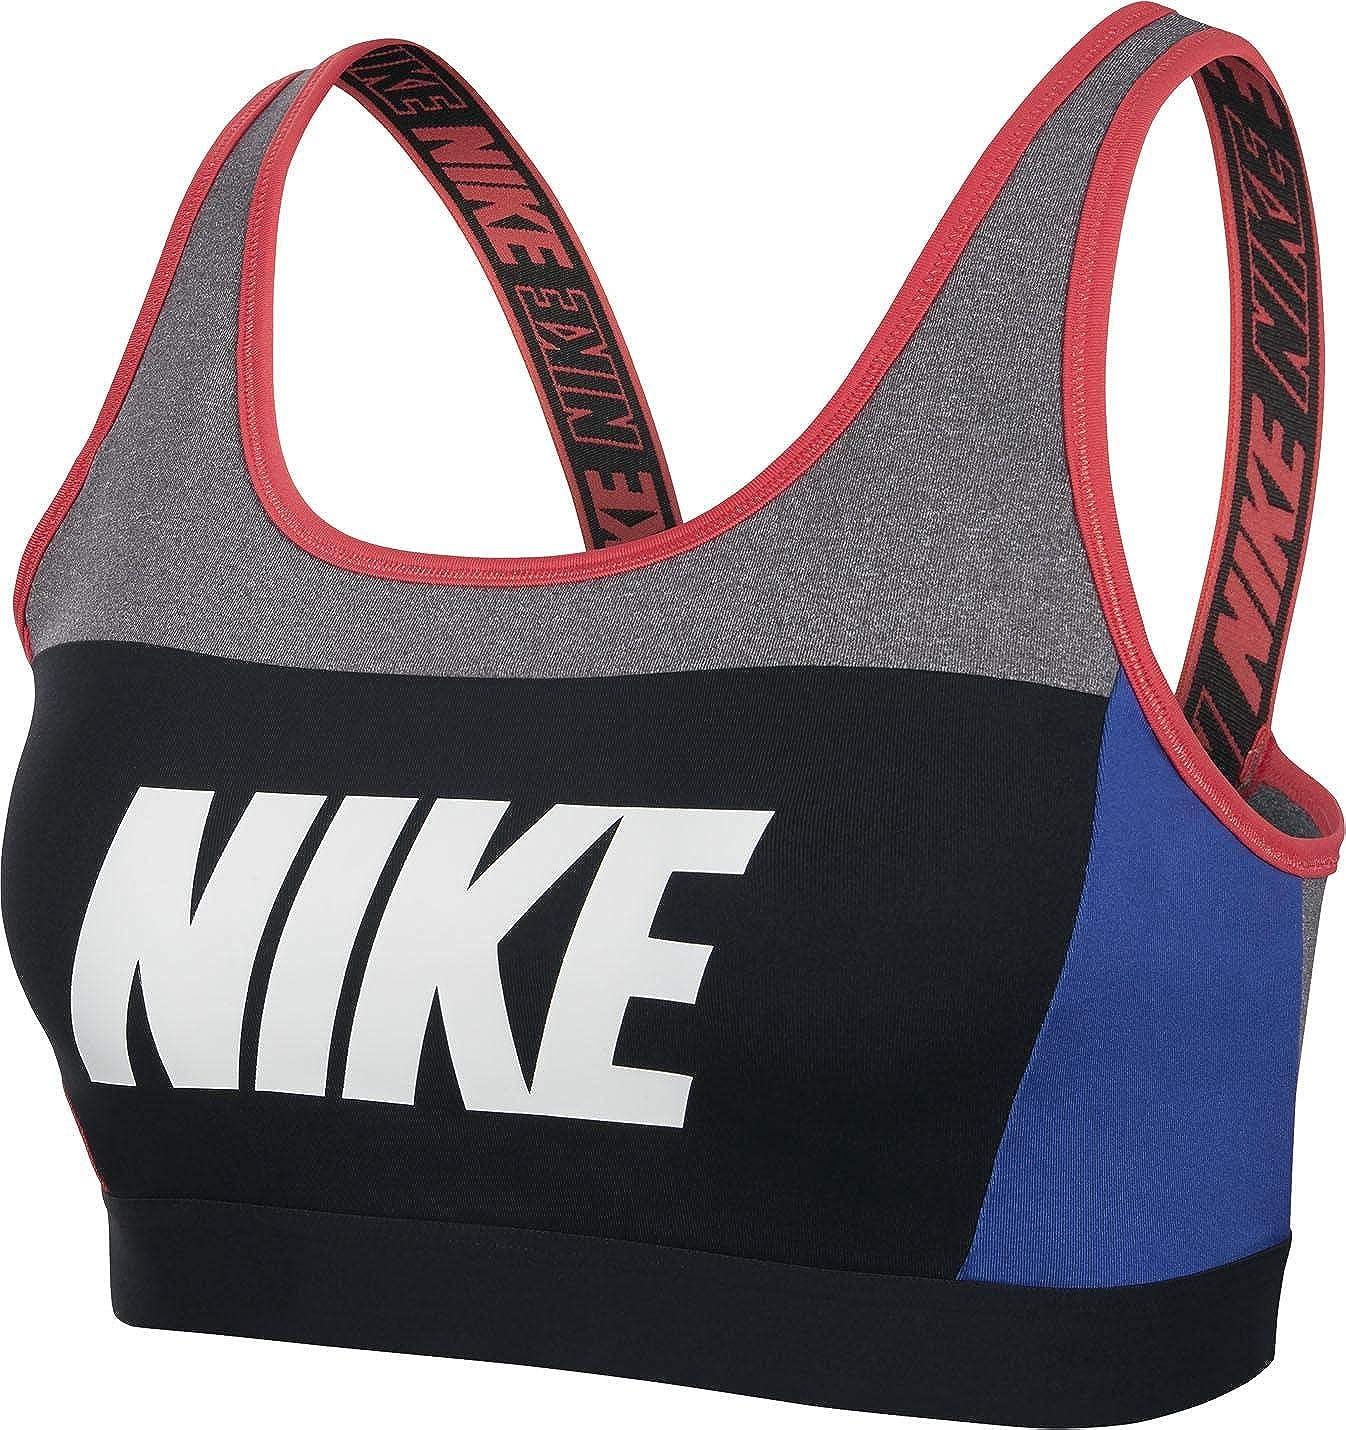 Nike AQ0142-092 Sujetador Deportivo, Carbon Heather/Game Royal ...